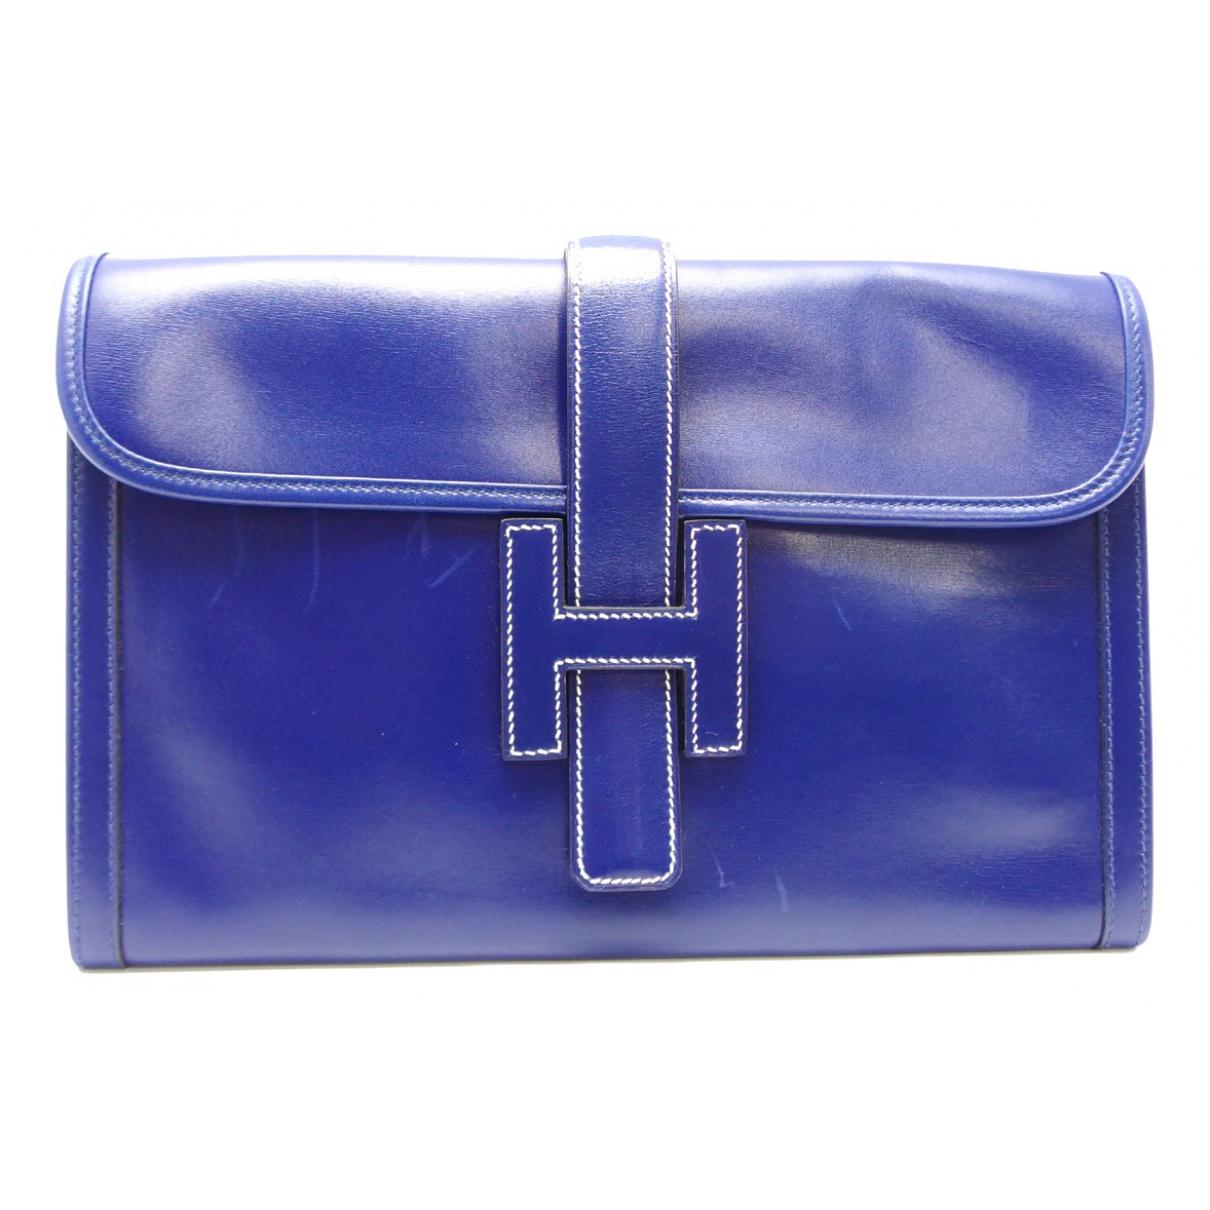 Hermes Jige Clutch in  Blau Leder